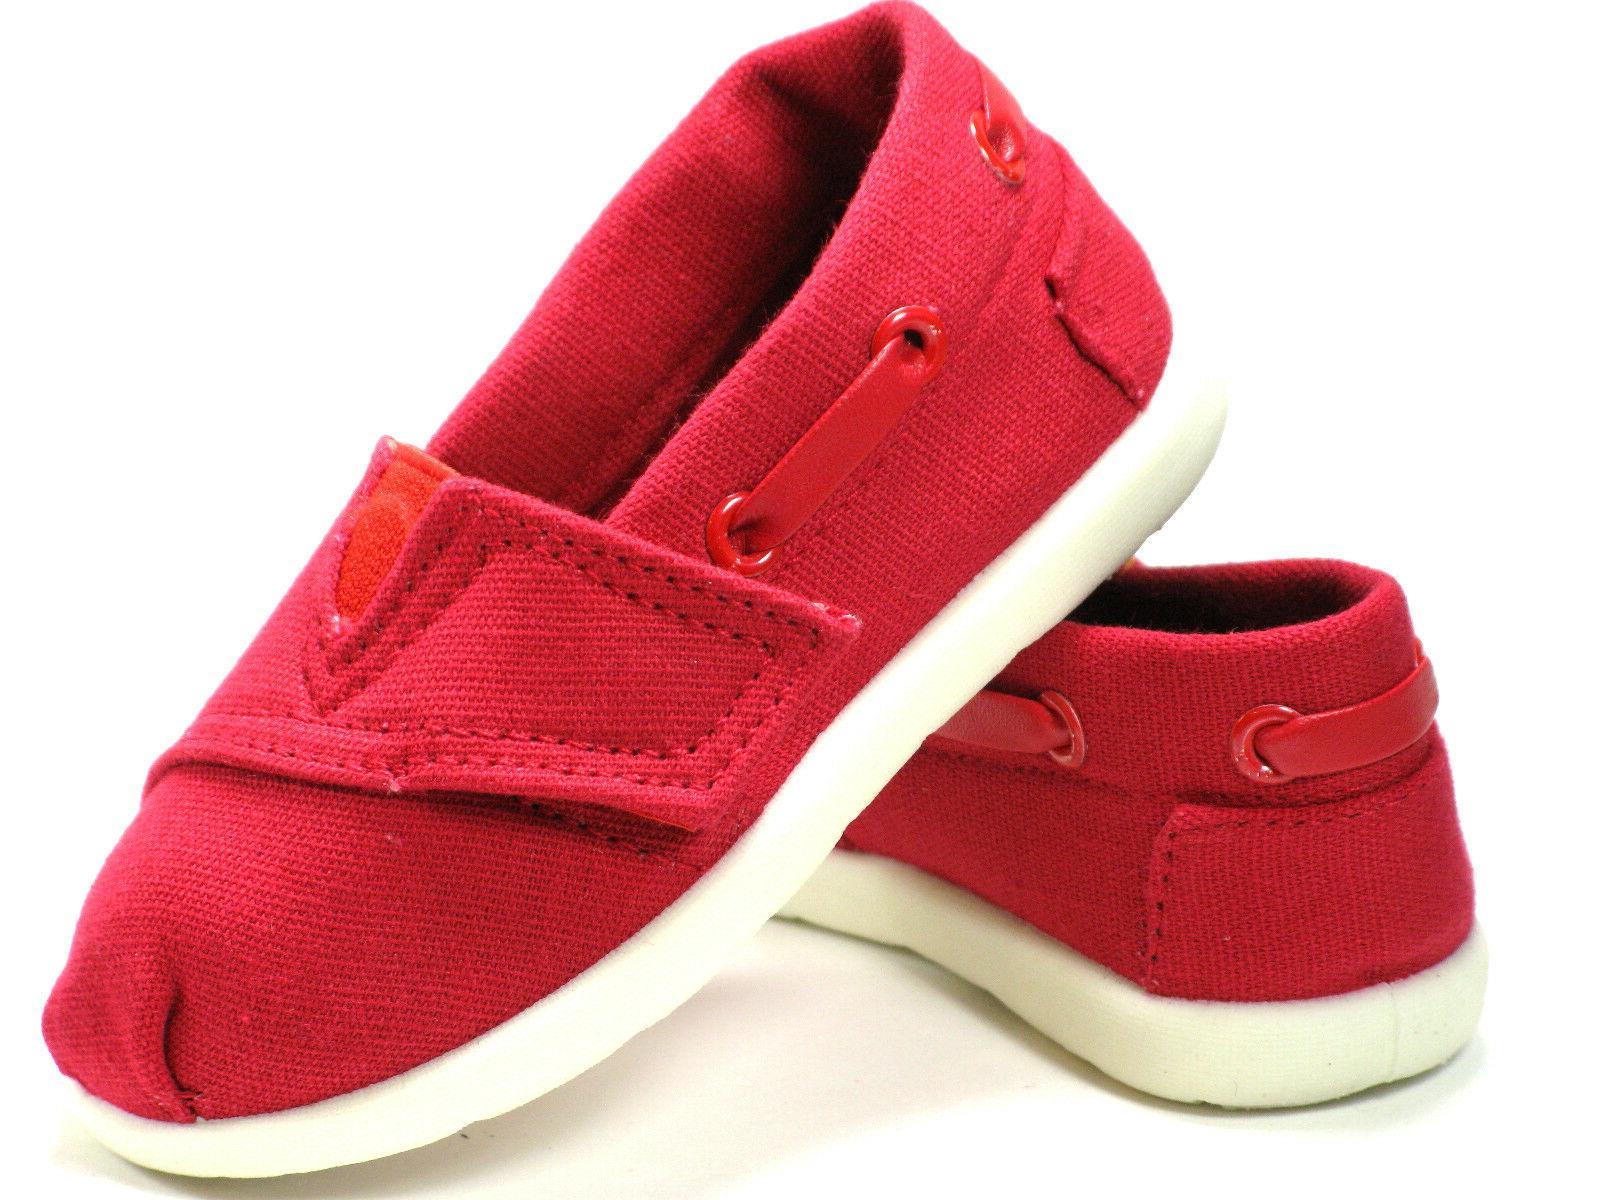 New Oxford Baby Boys Girls Size 4 7 8